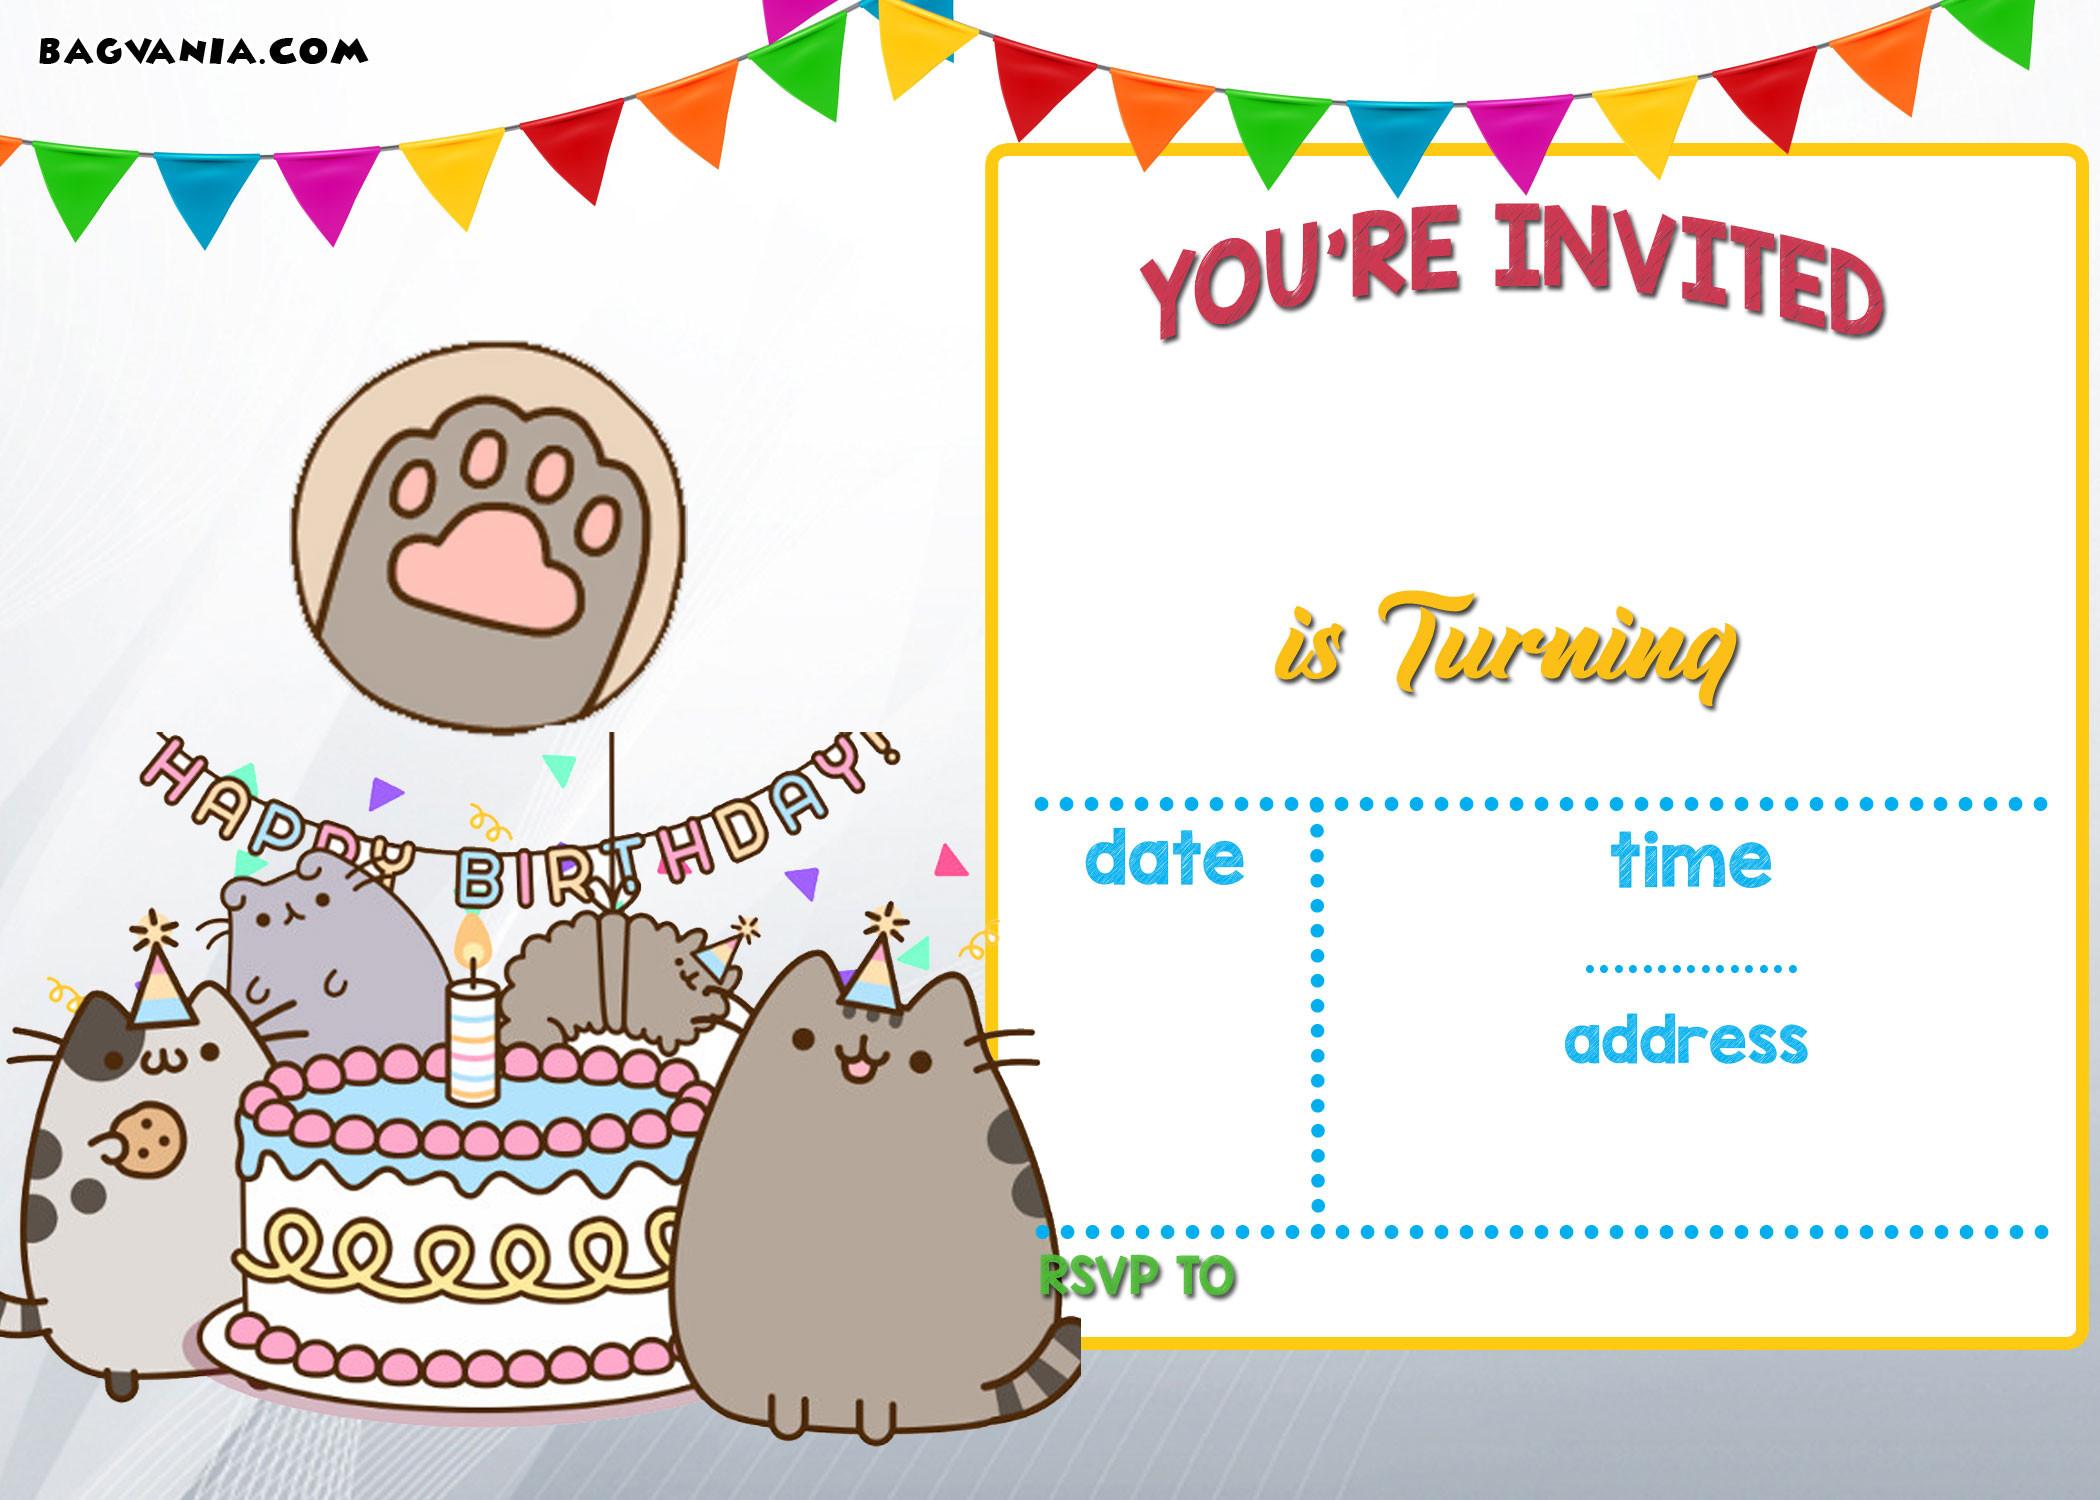 Free Templates For Birthday Invitations  FREE Printable Pusheen Birthday Invitation Template